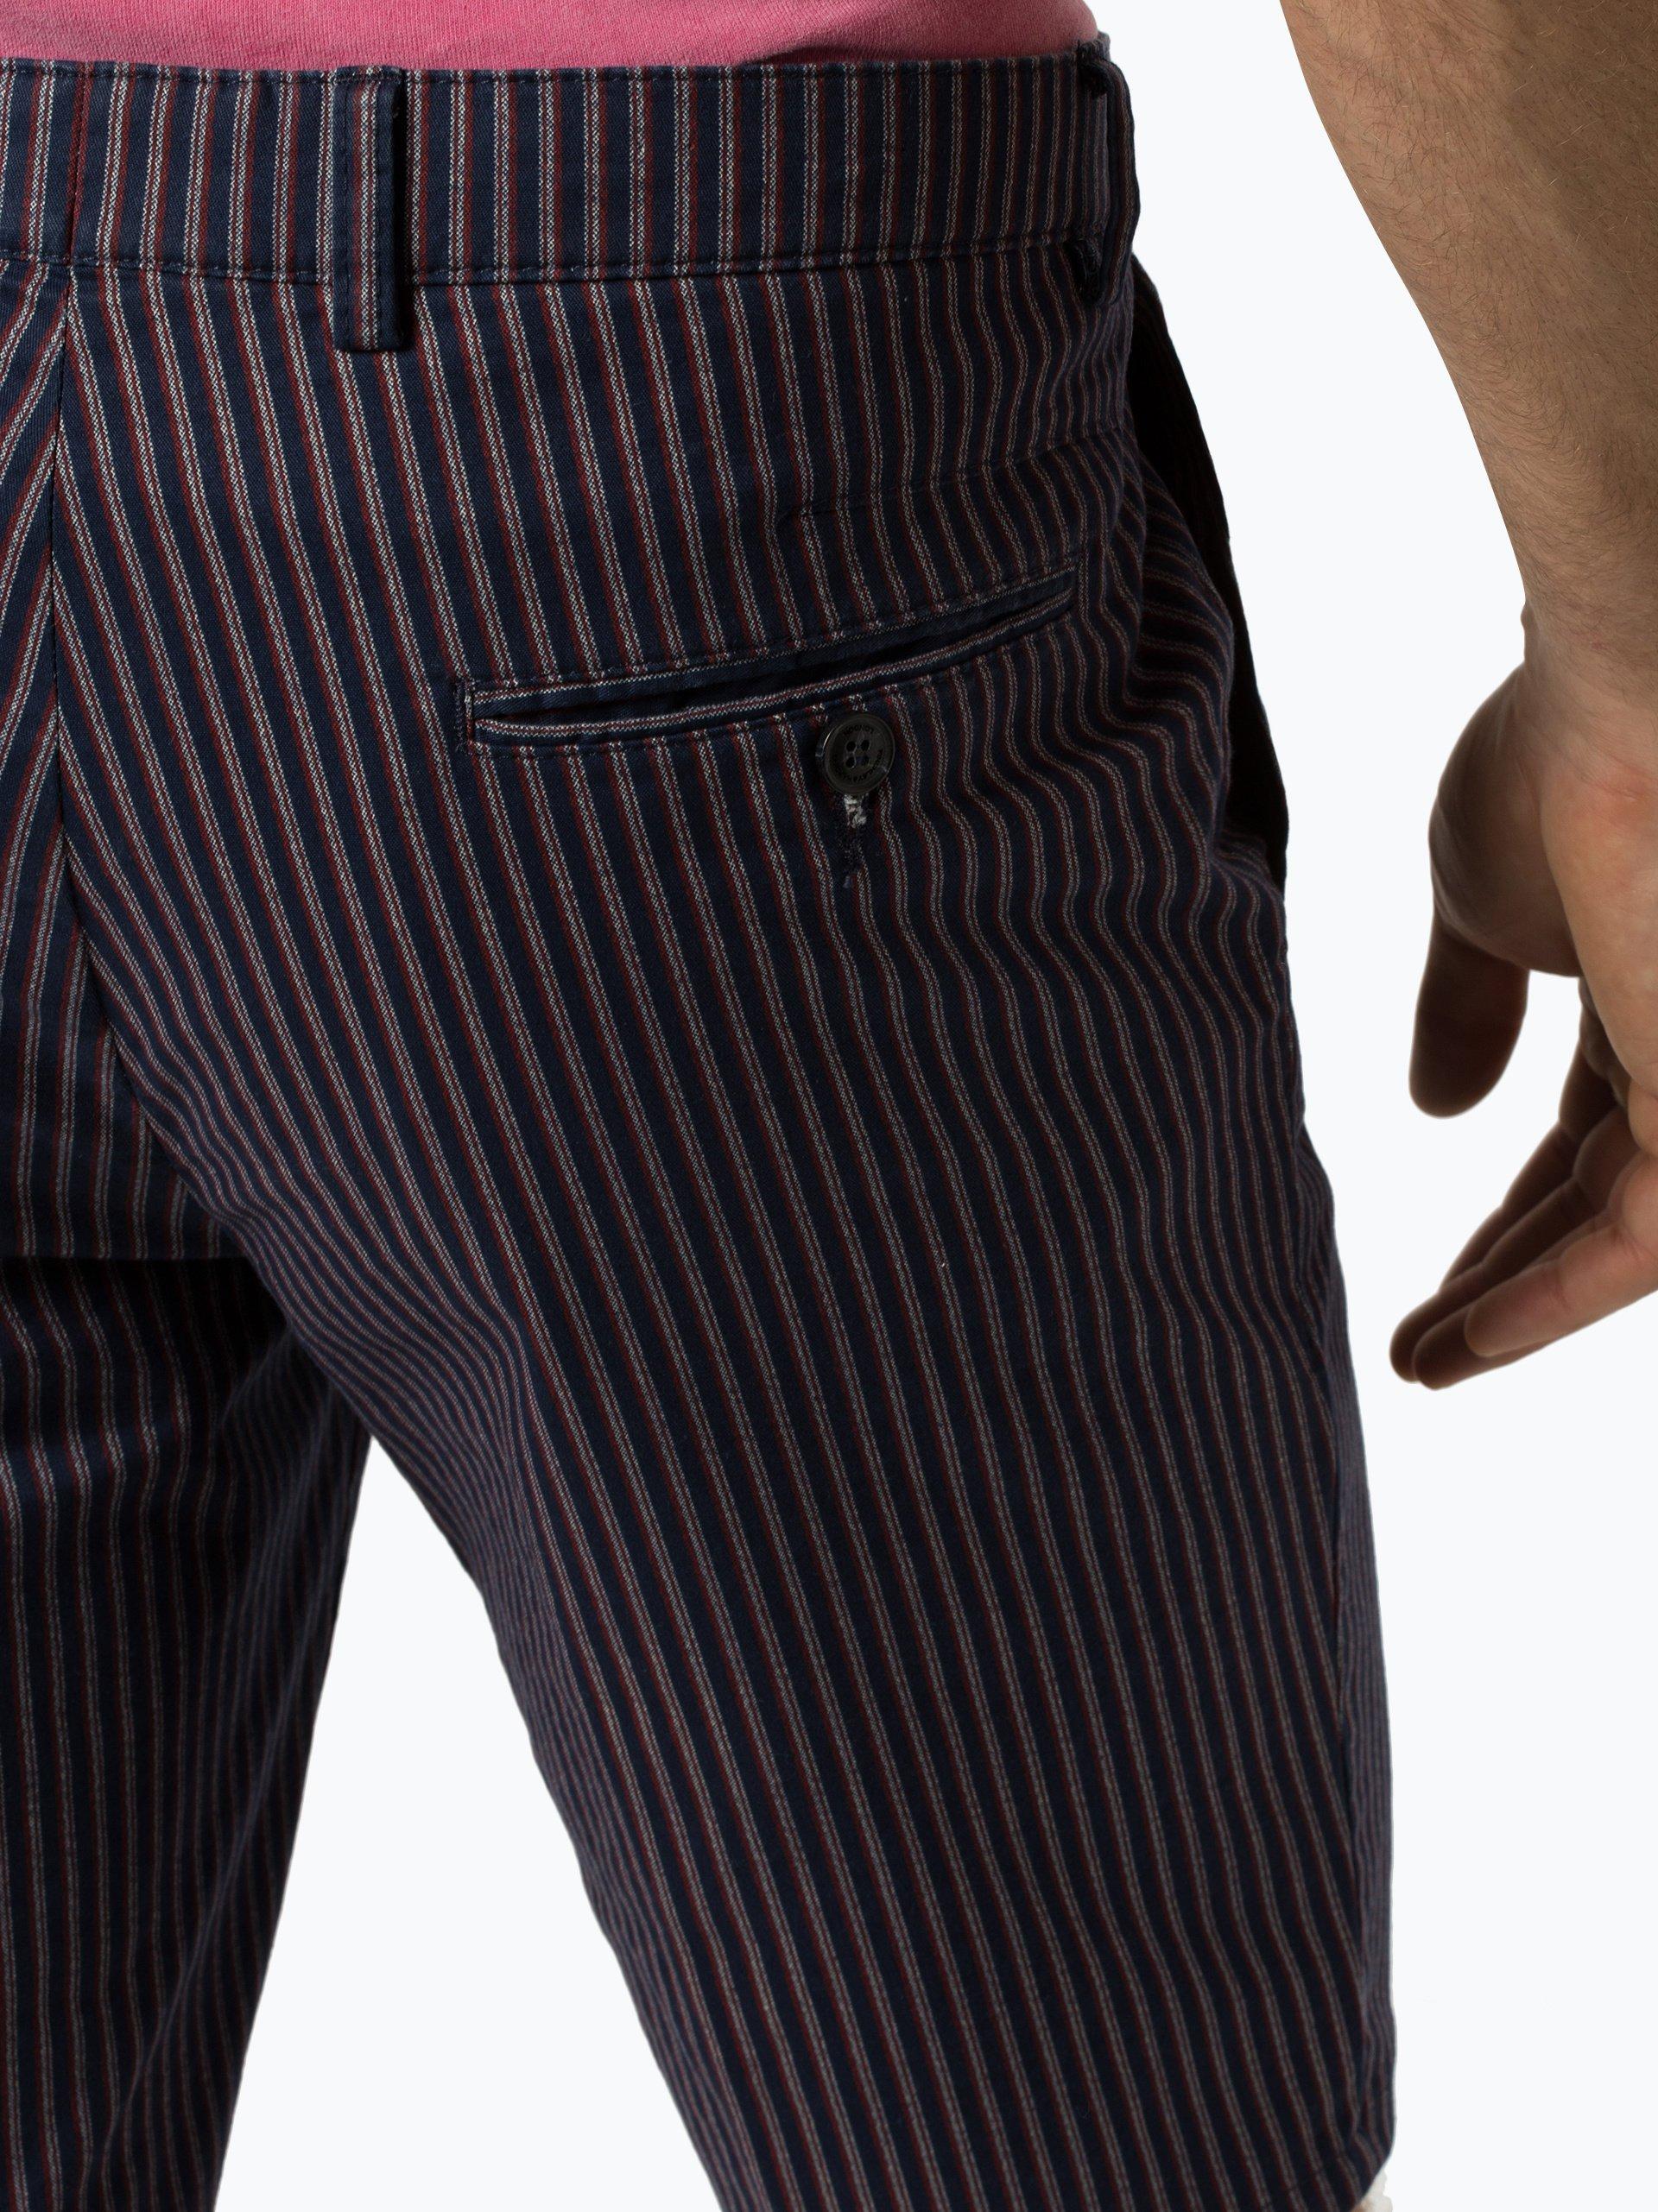 Finshley & Harding London Herren Shorts - Kevin